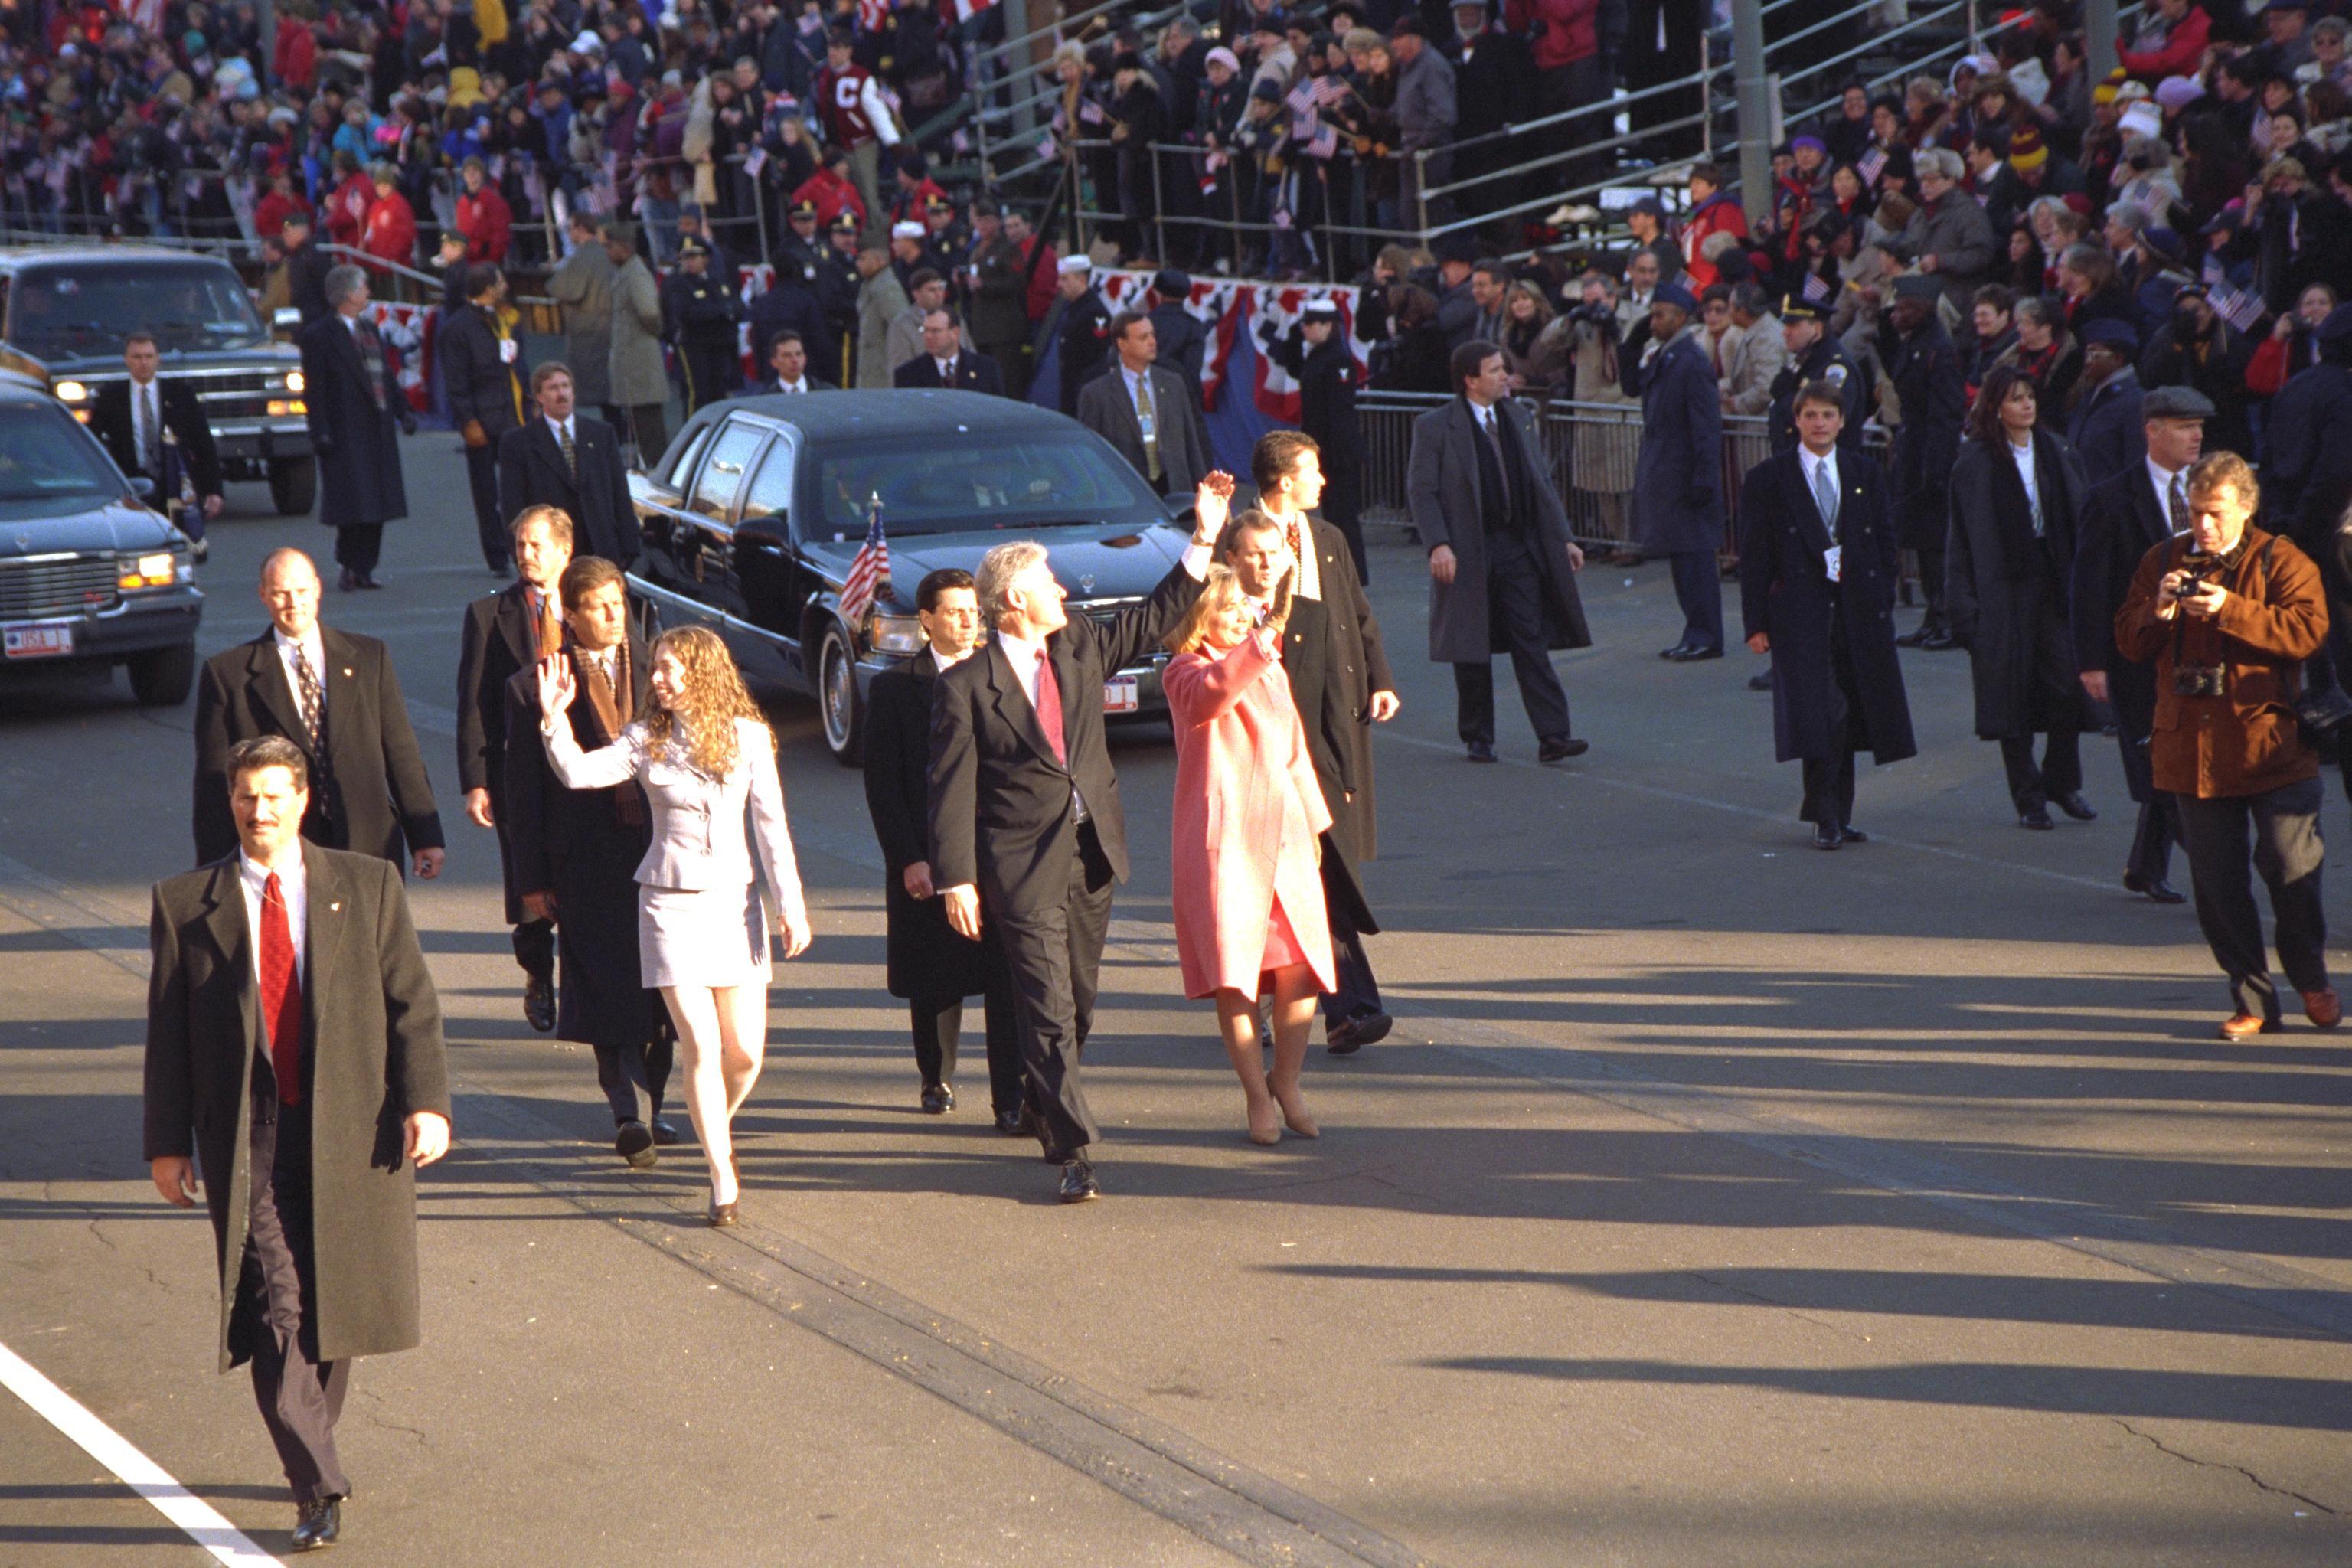 File:1997 Clinton Inauguration.jpg